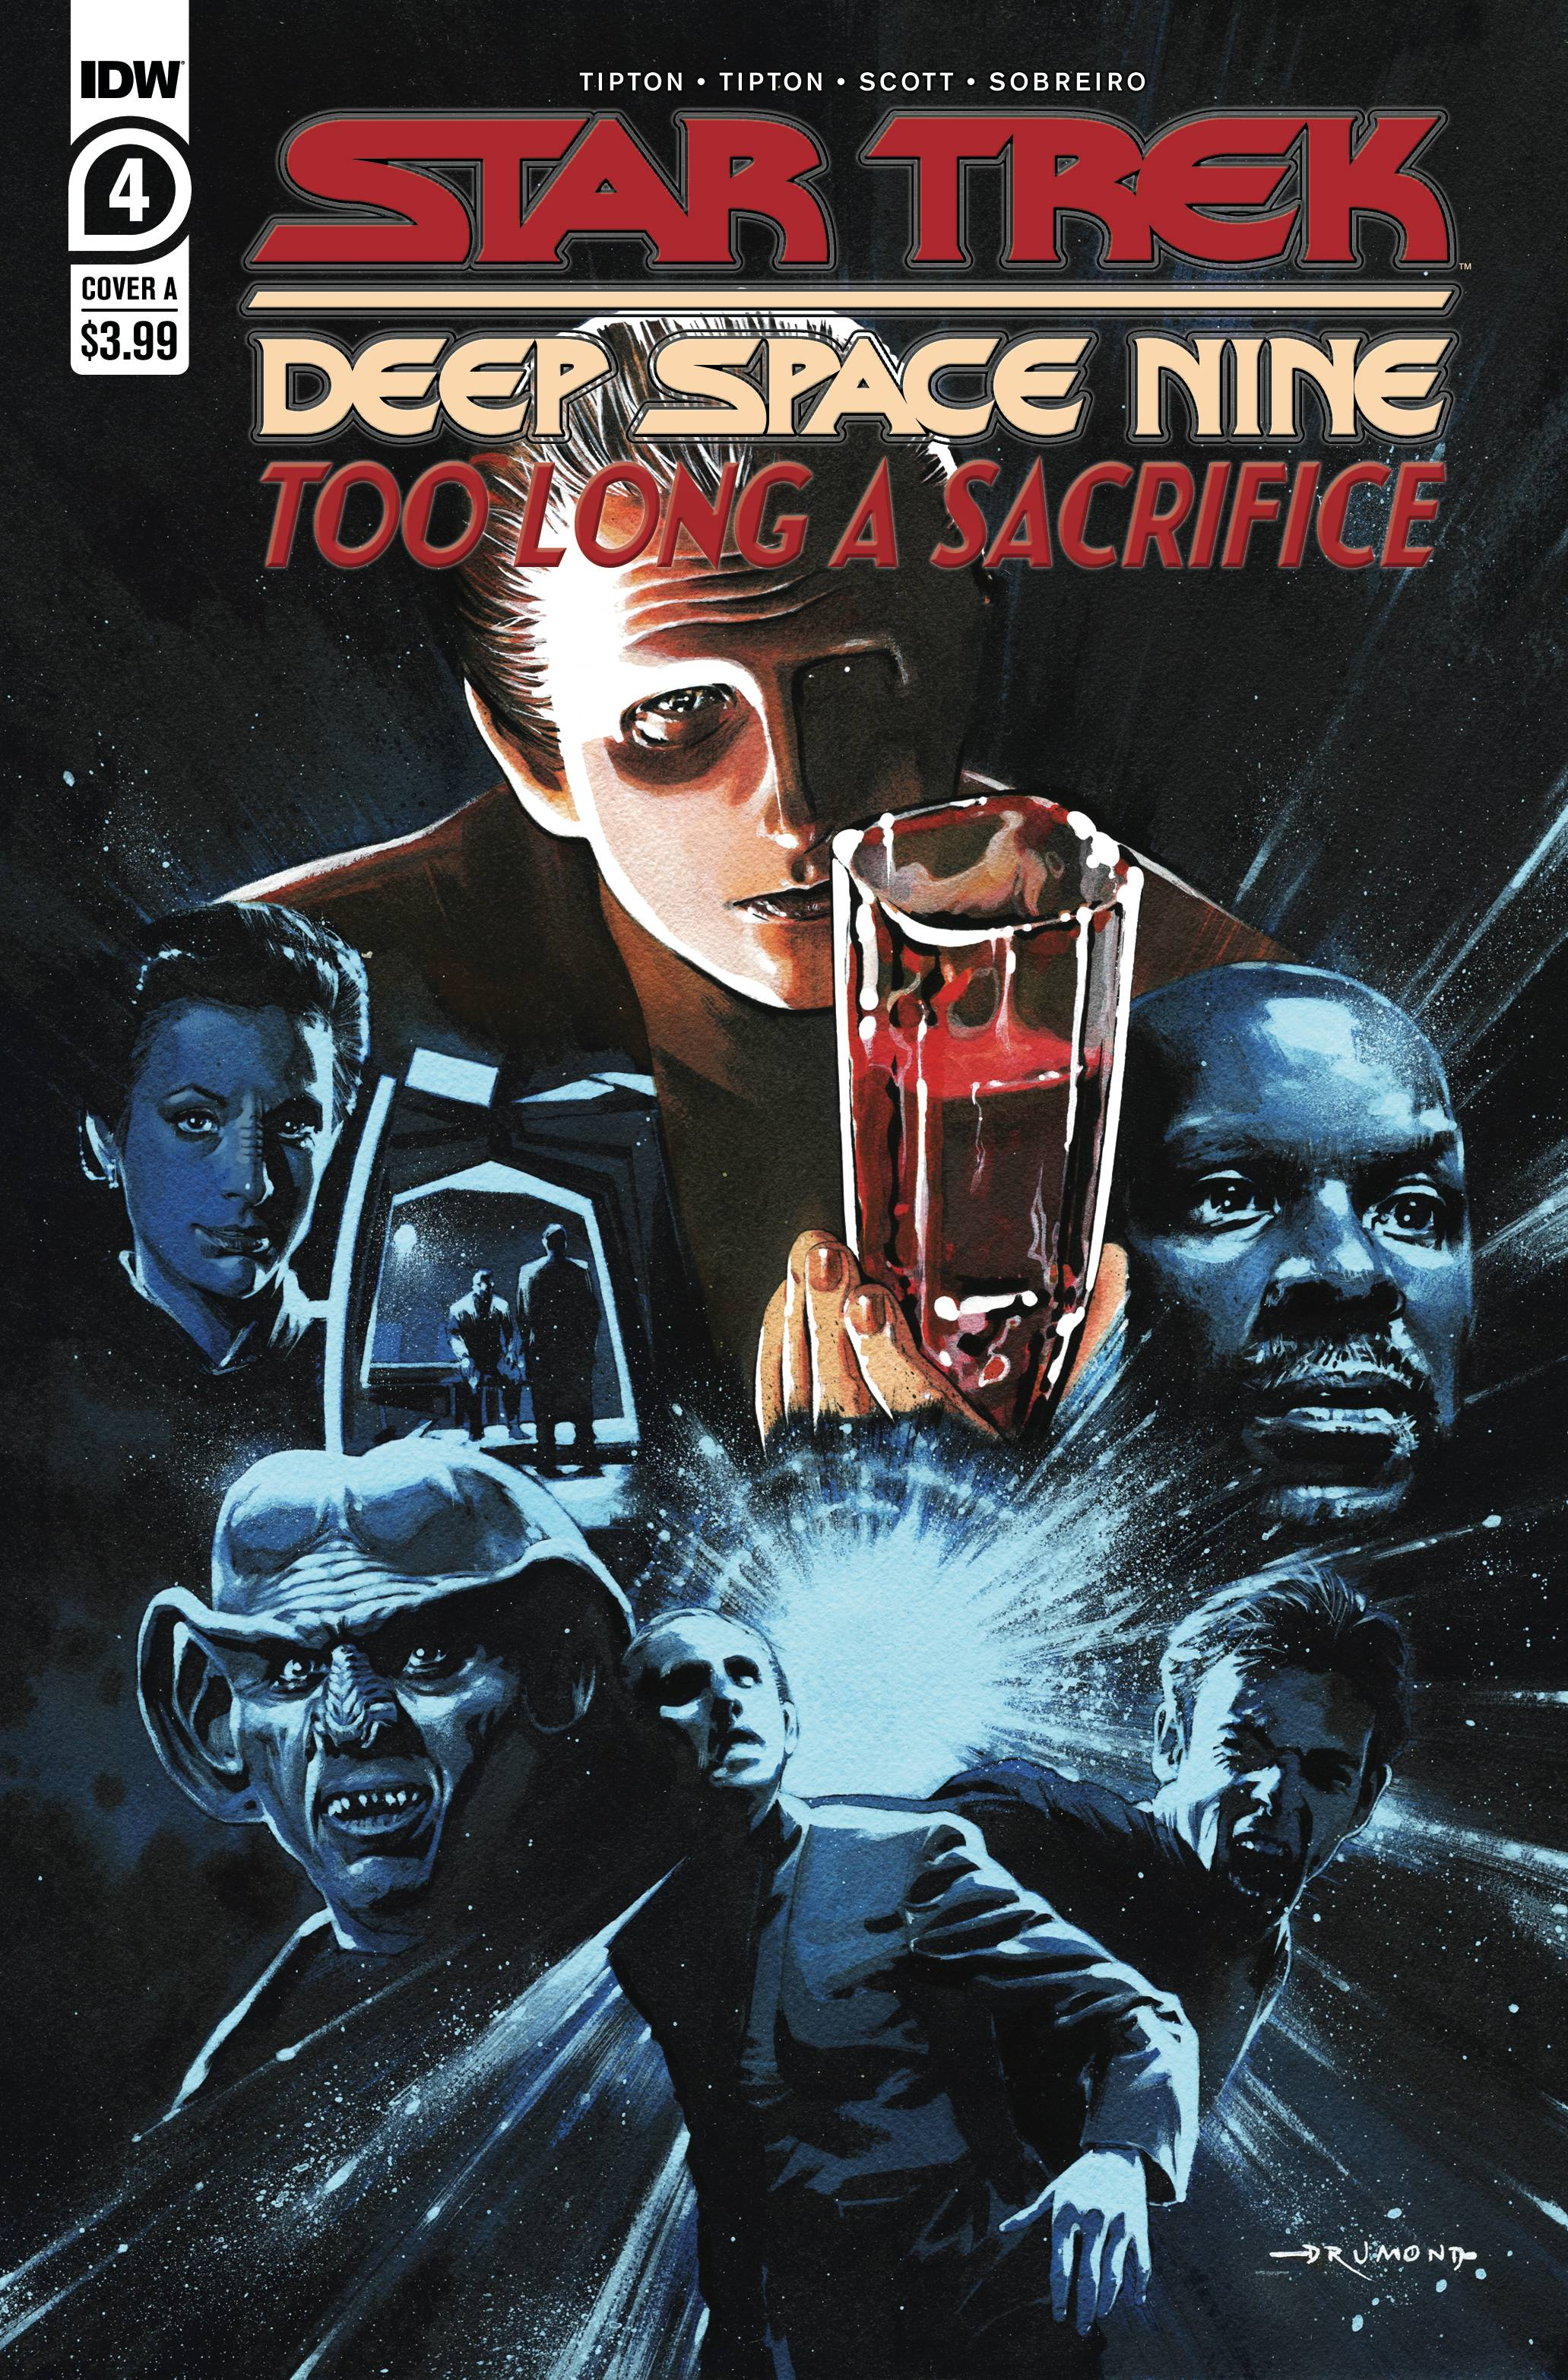 Star Trek: Deep Space Nine - Too Long A Sacrifice #4 (2020)